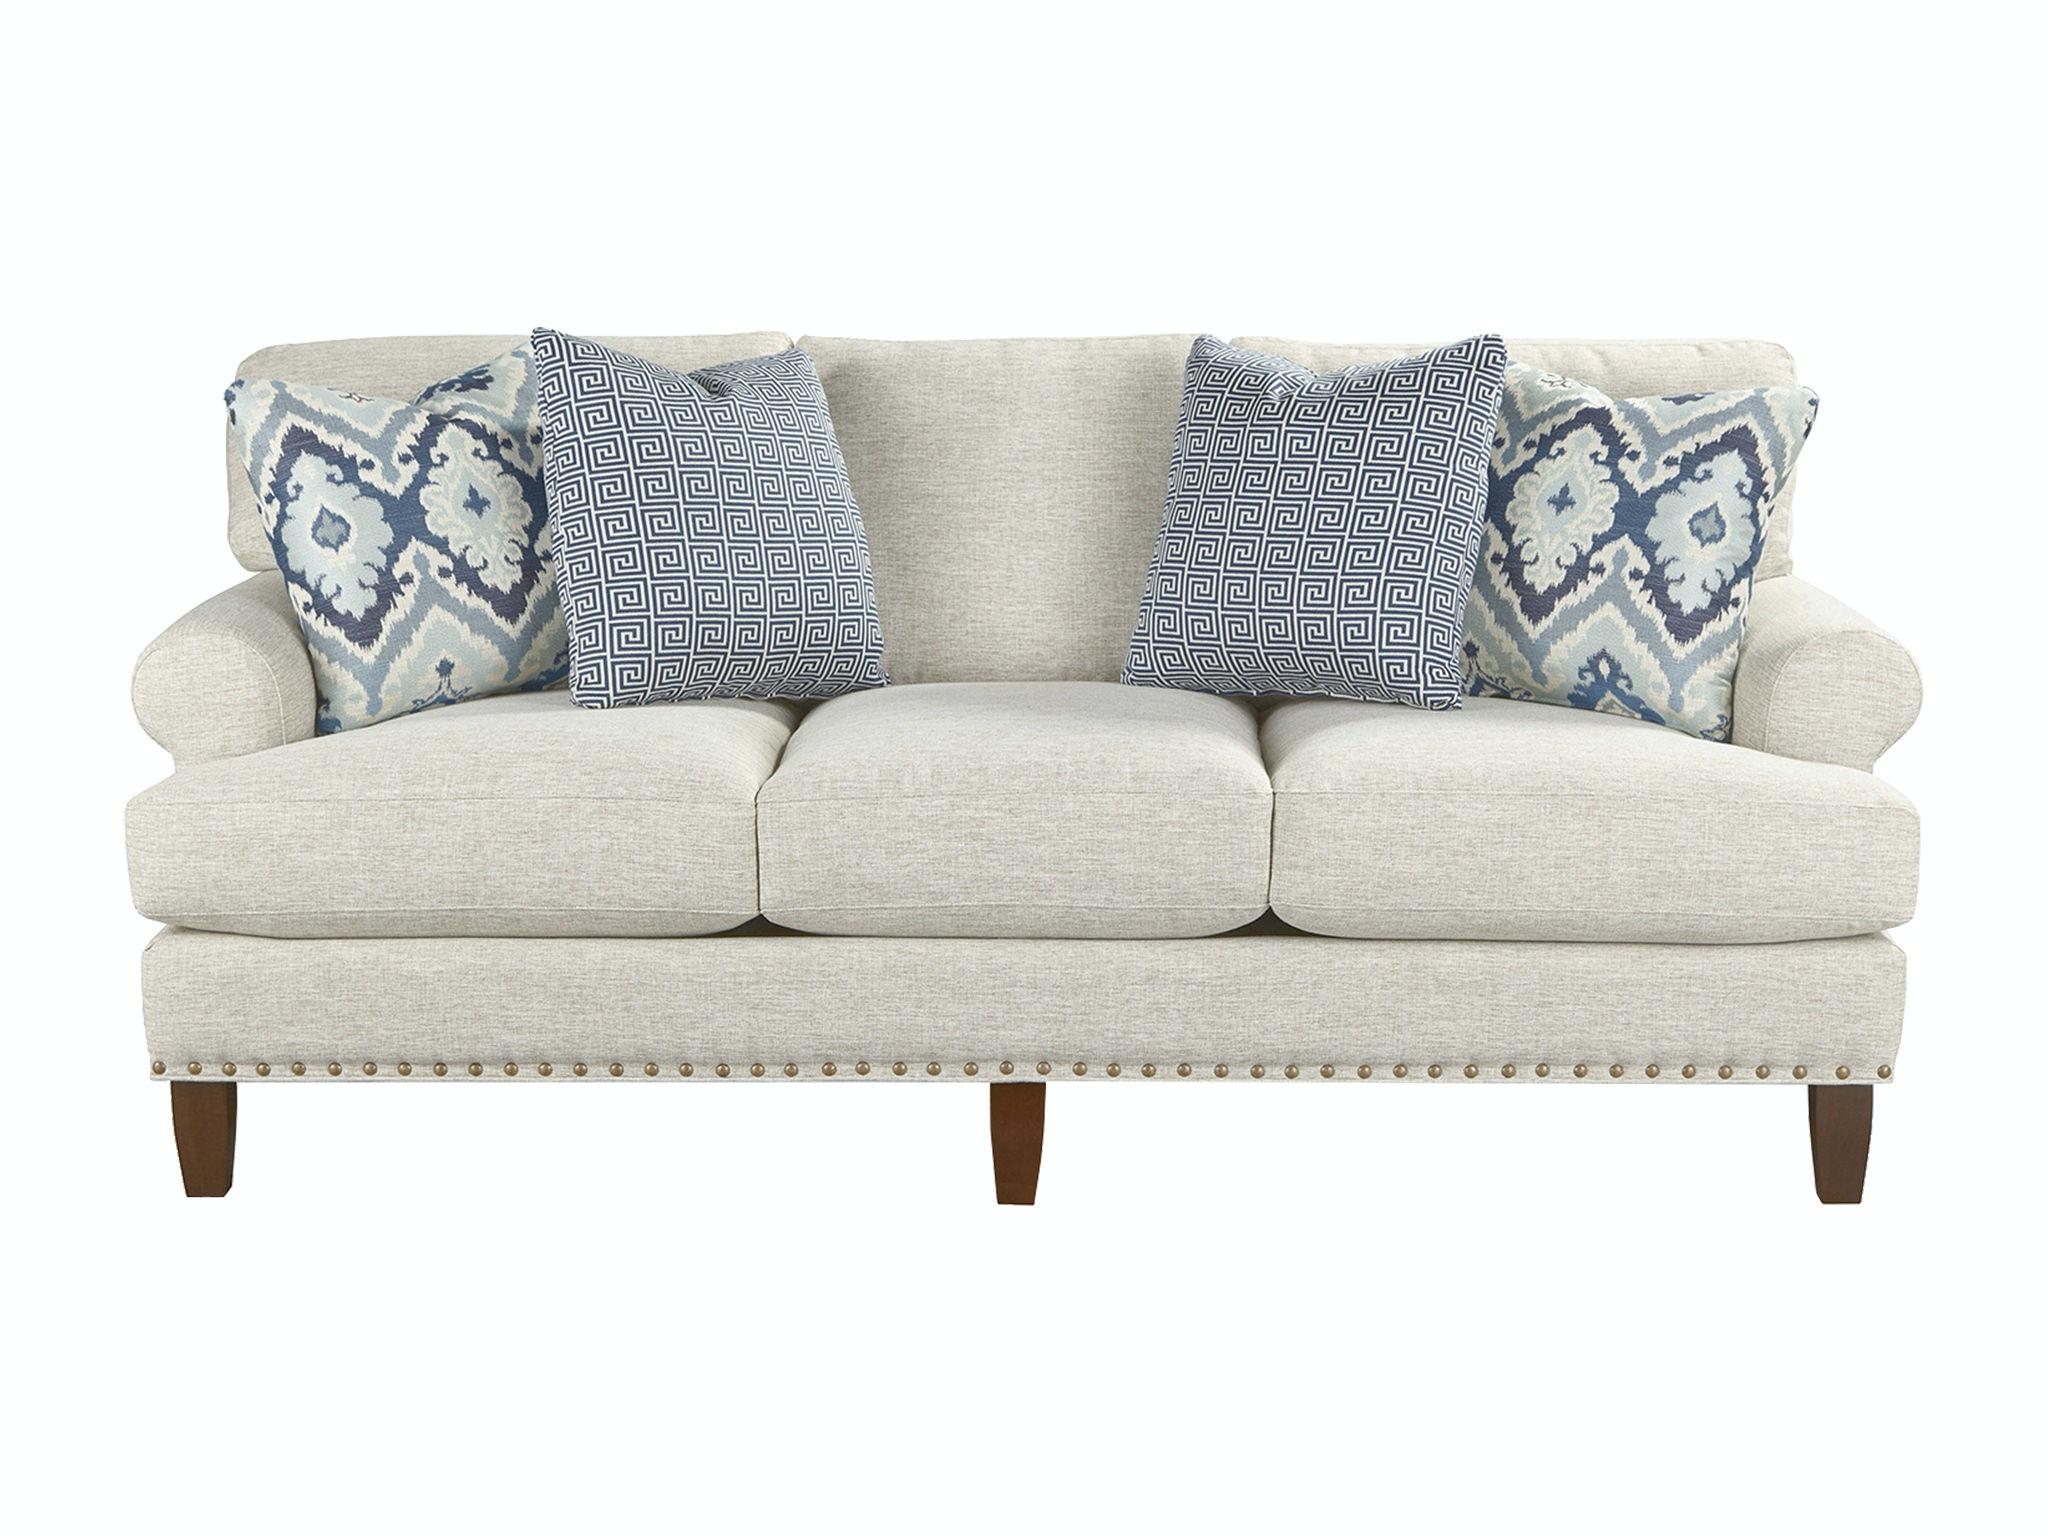 craftmaster living room furniture area sofa 767350 hiddenite nc